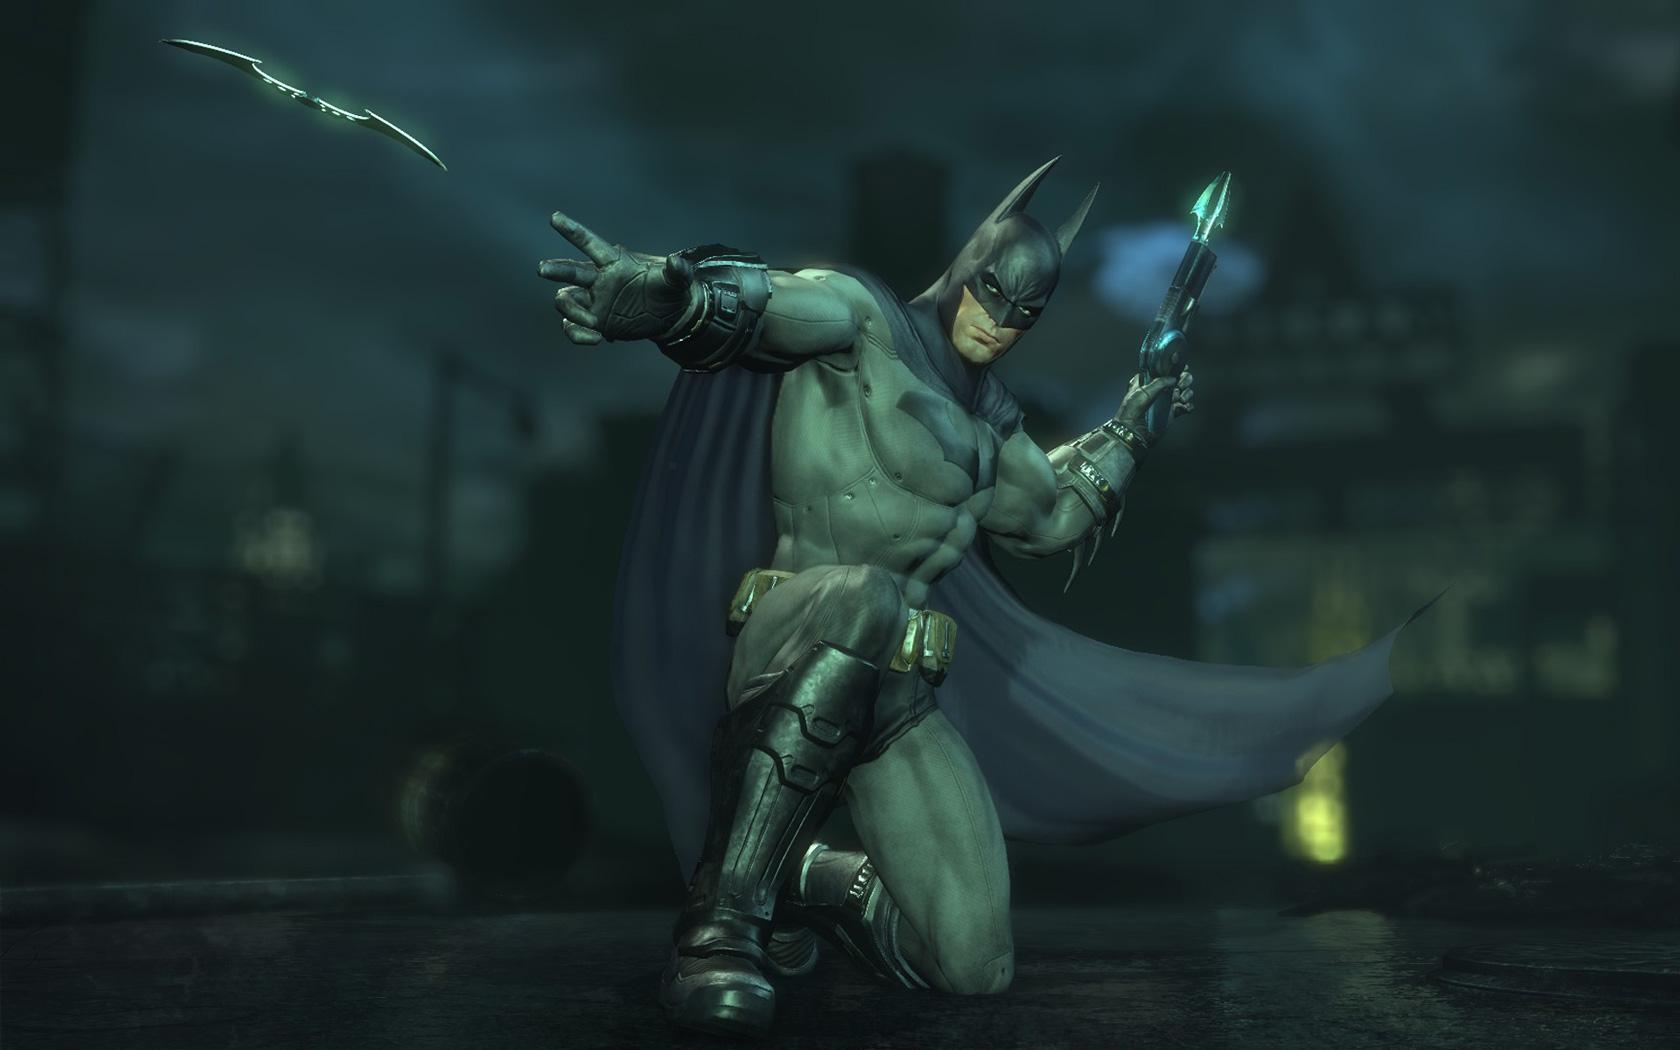 Free Batman: Arkham City Wallpaper in 1680x1050